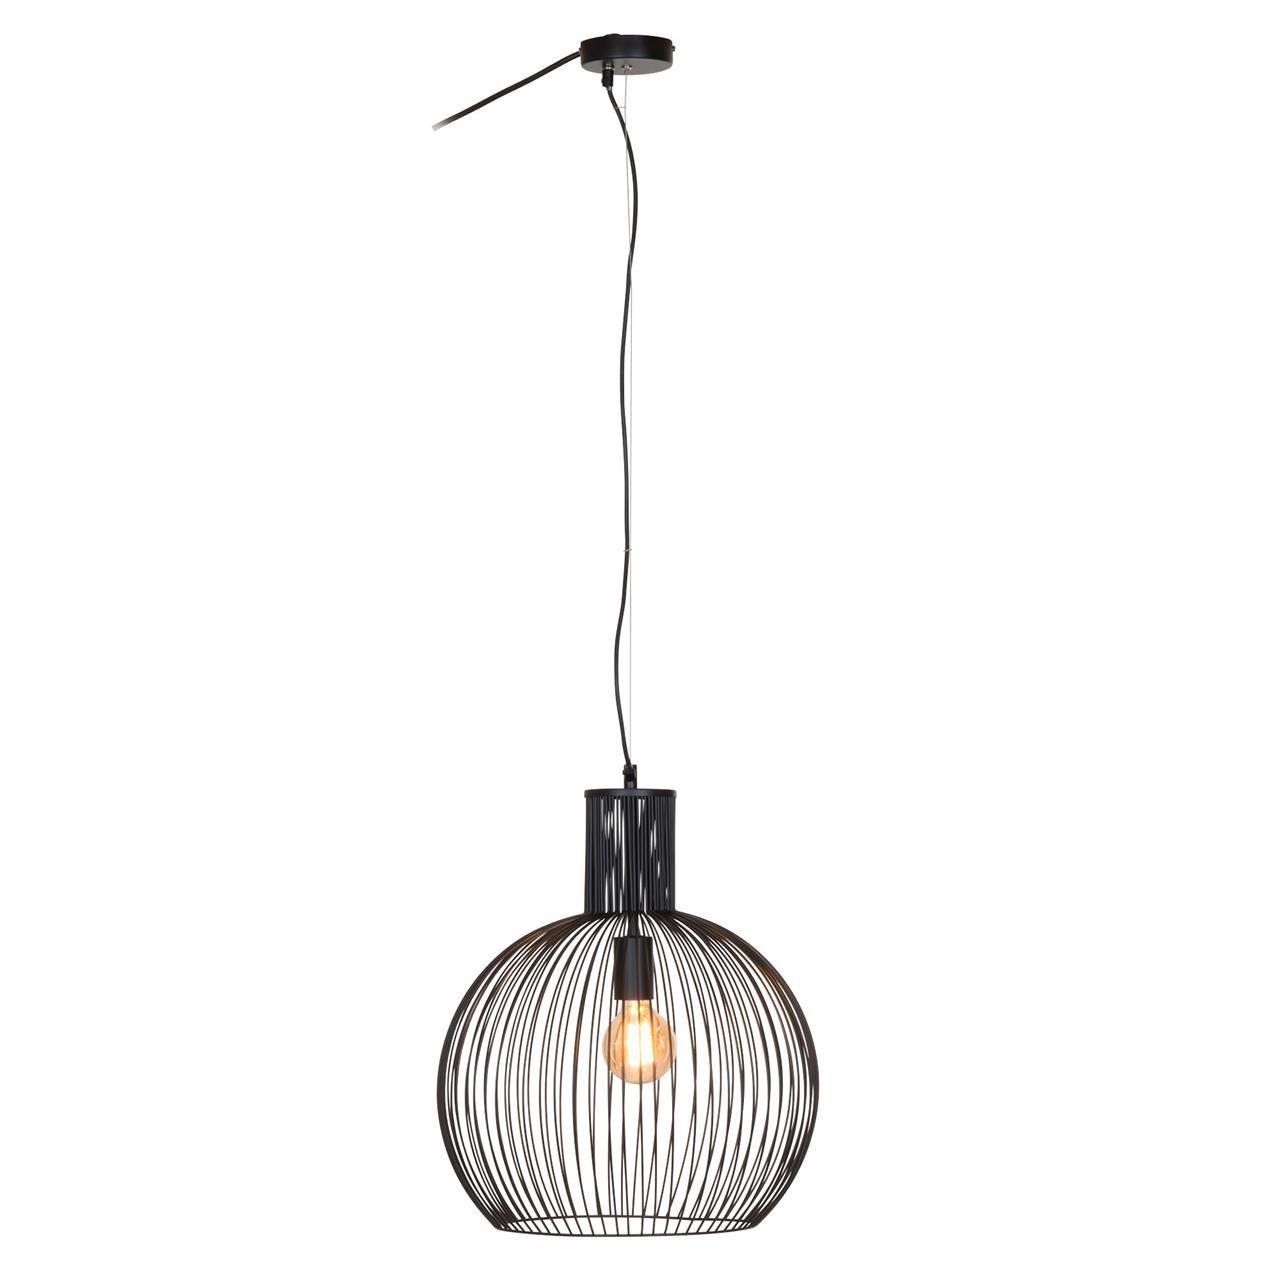 Hanglamp Diana Zwart  KwantumNajaar  Hanglamp Lampen